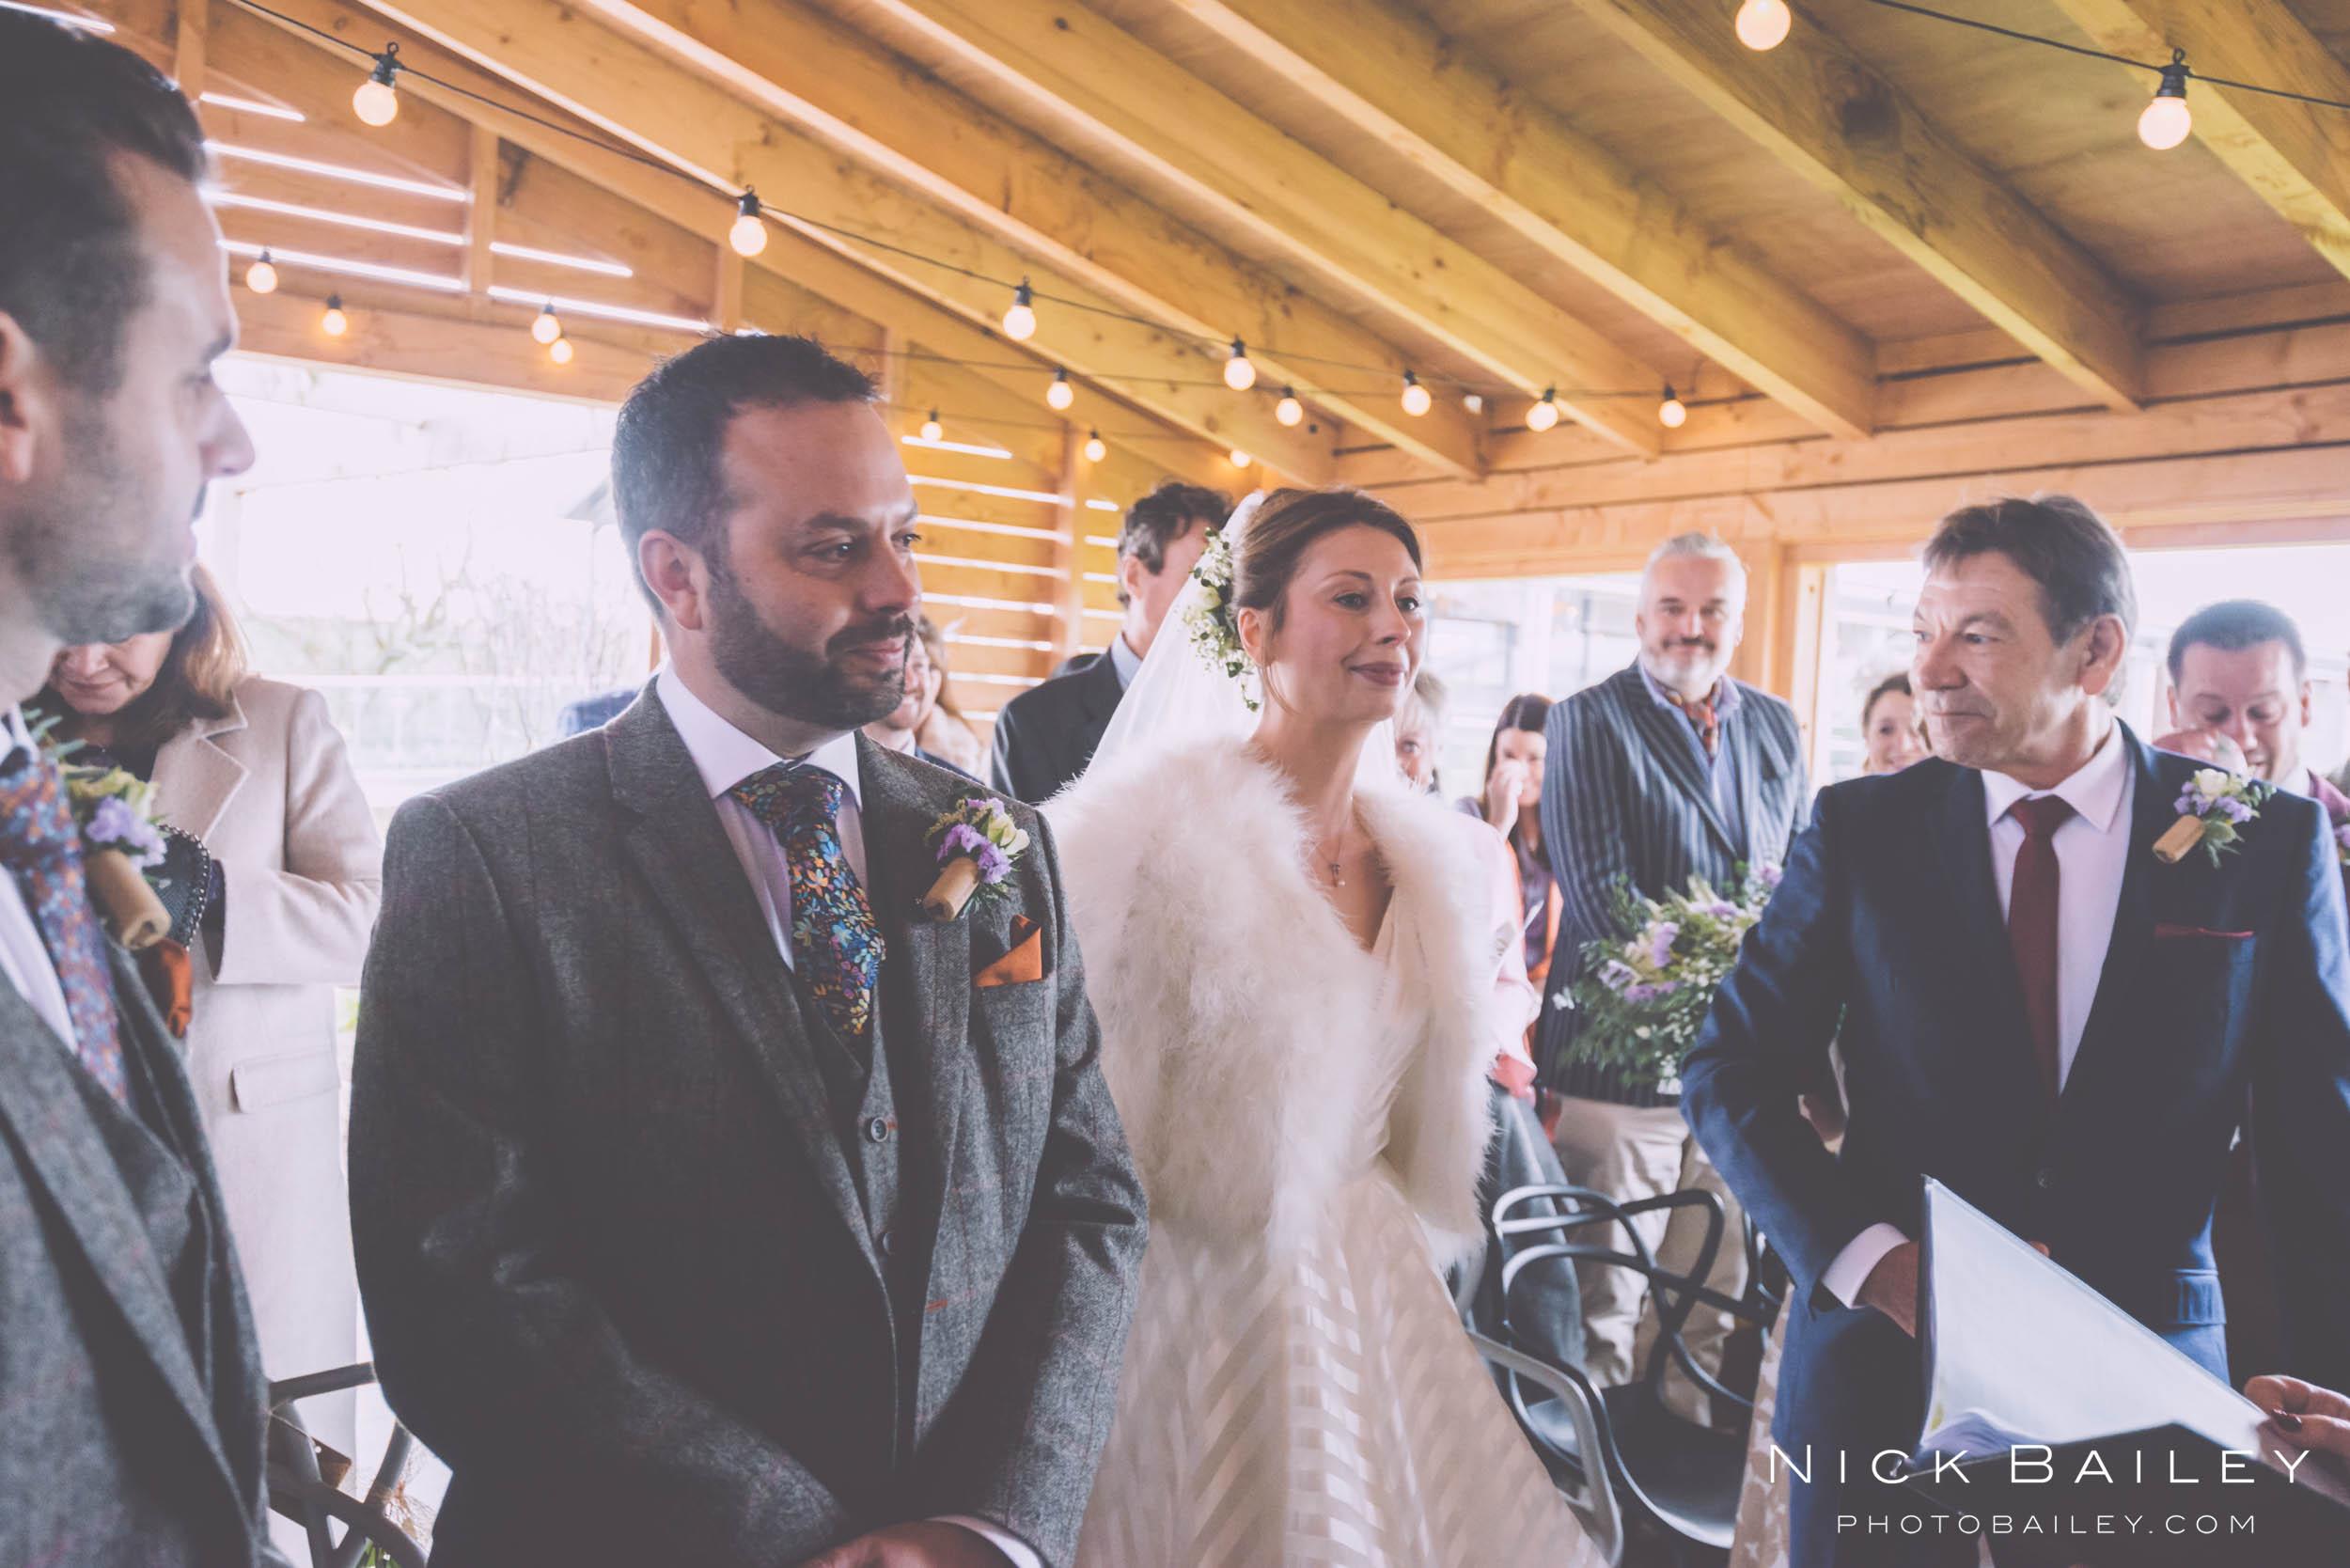 trevibban-mill-wedding-29.jpg